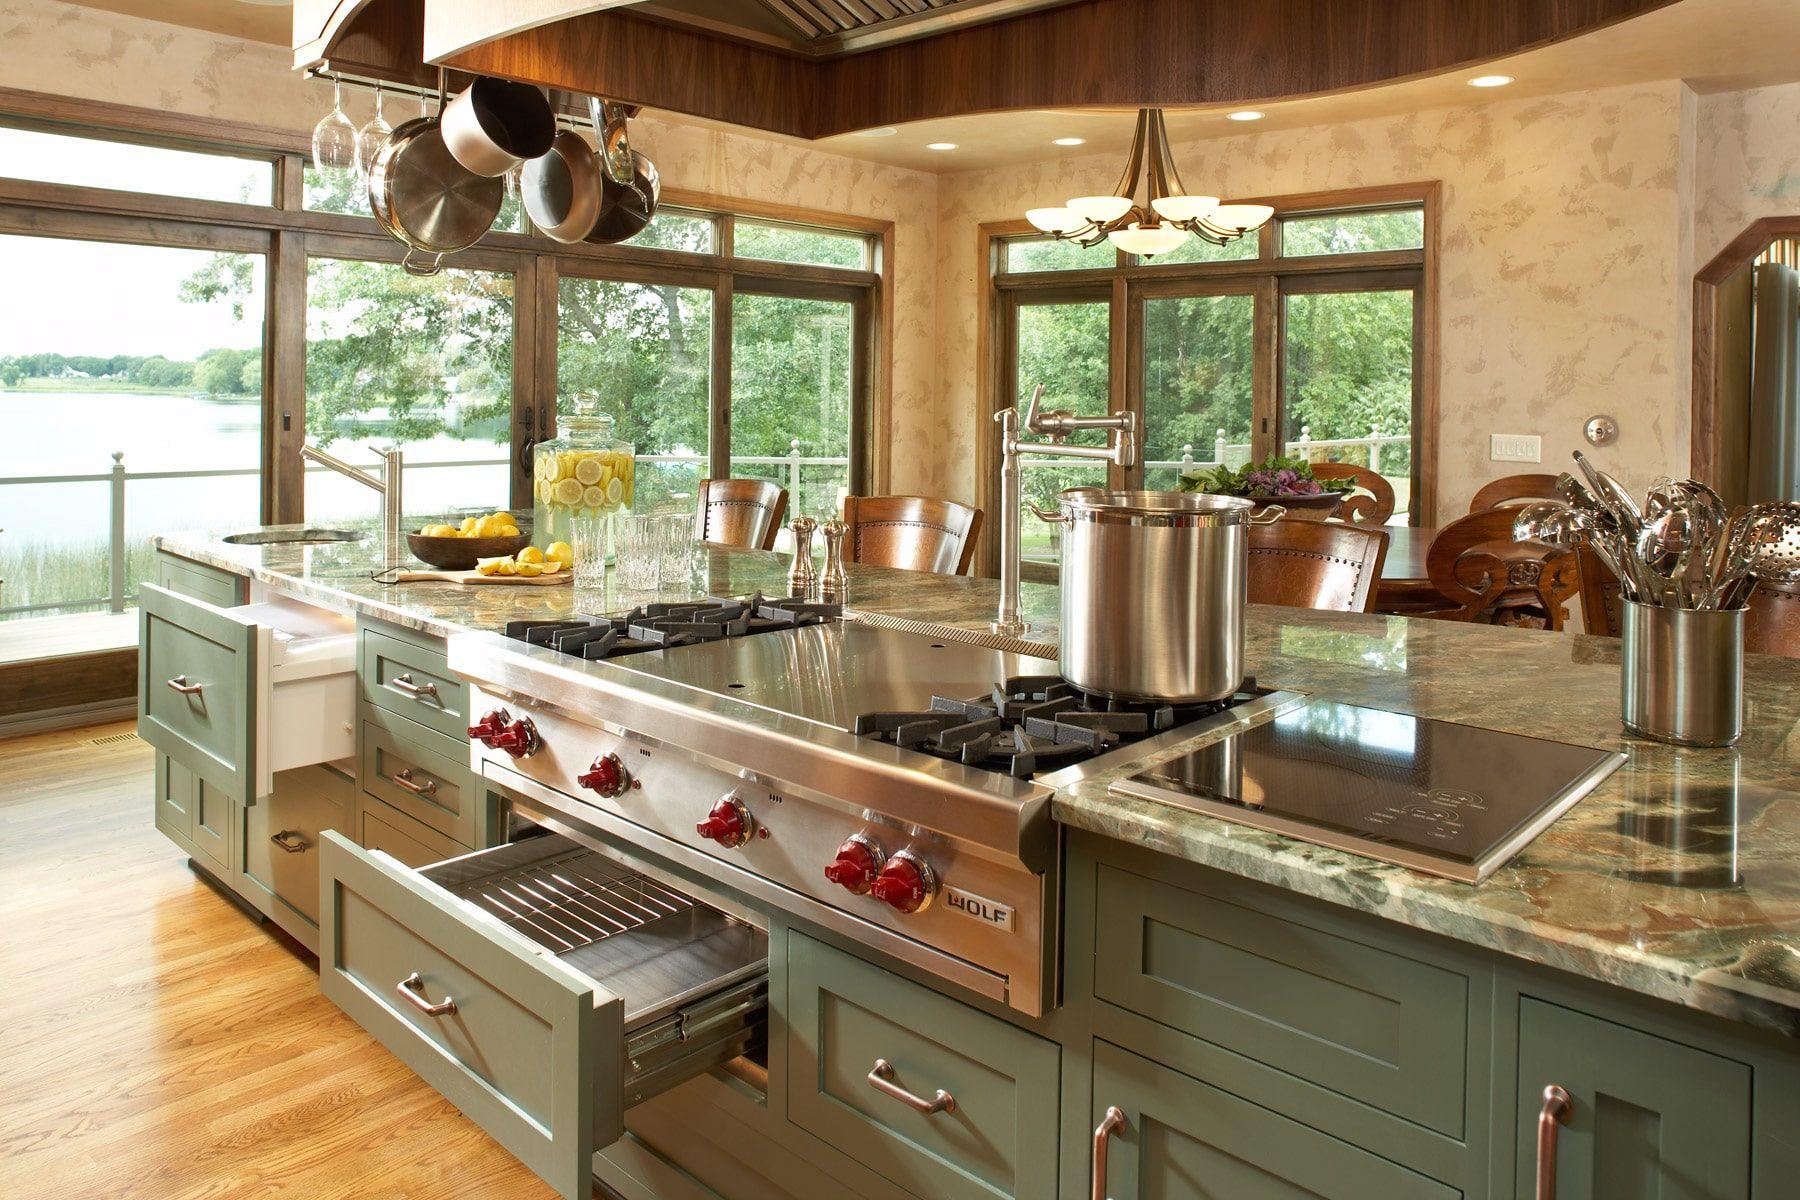 gourmet kitchen interior designers minneapolis kitchen island with cooktop kitchen island on kitchen ideas with island id=43667